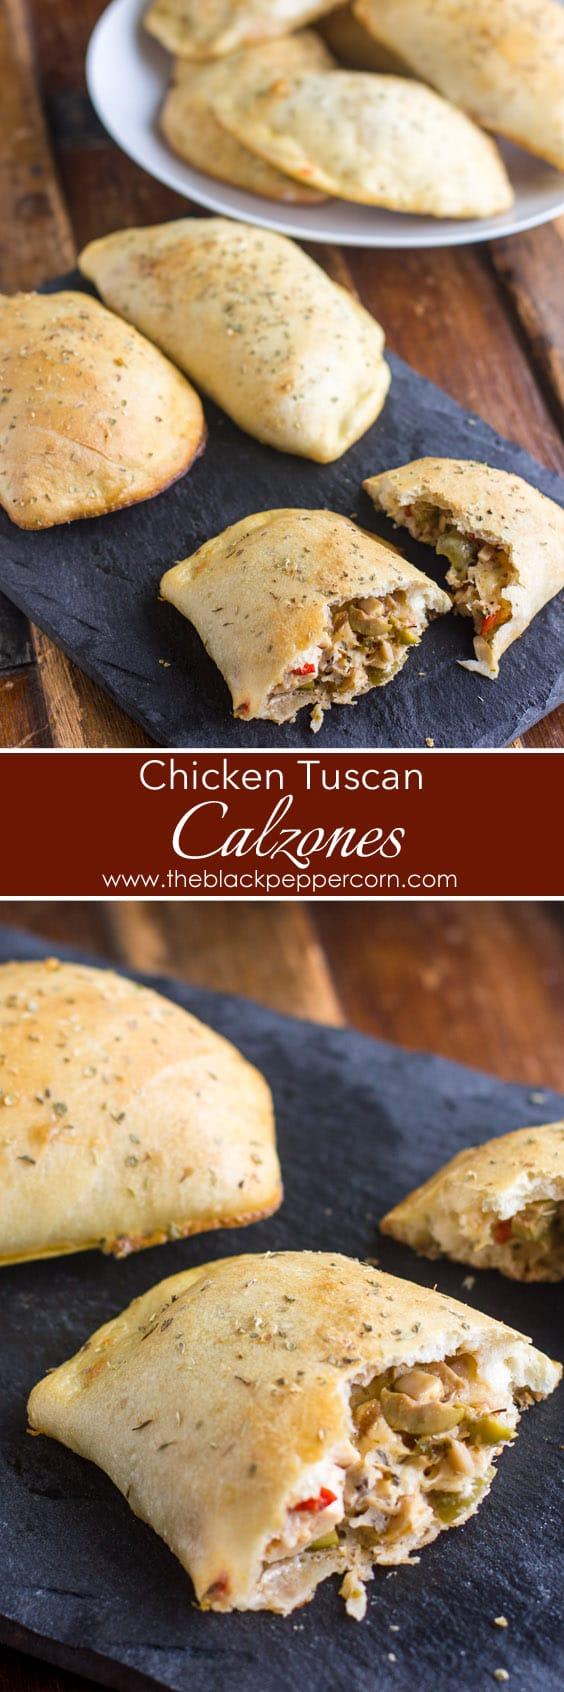 Chicken Tuscan Calzones